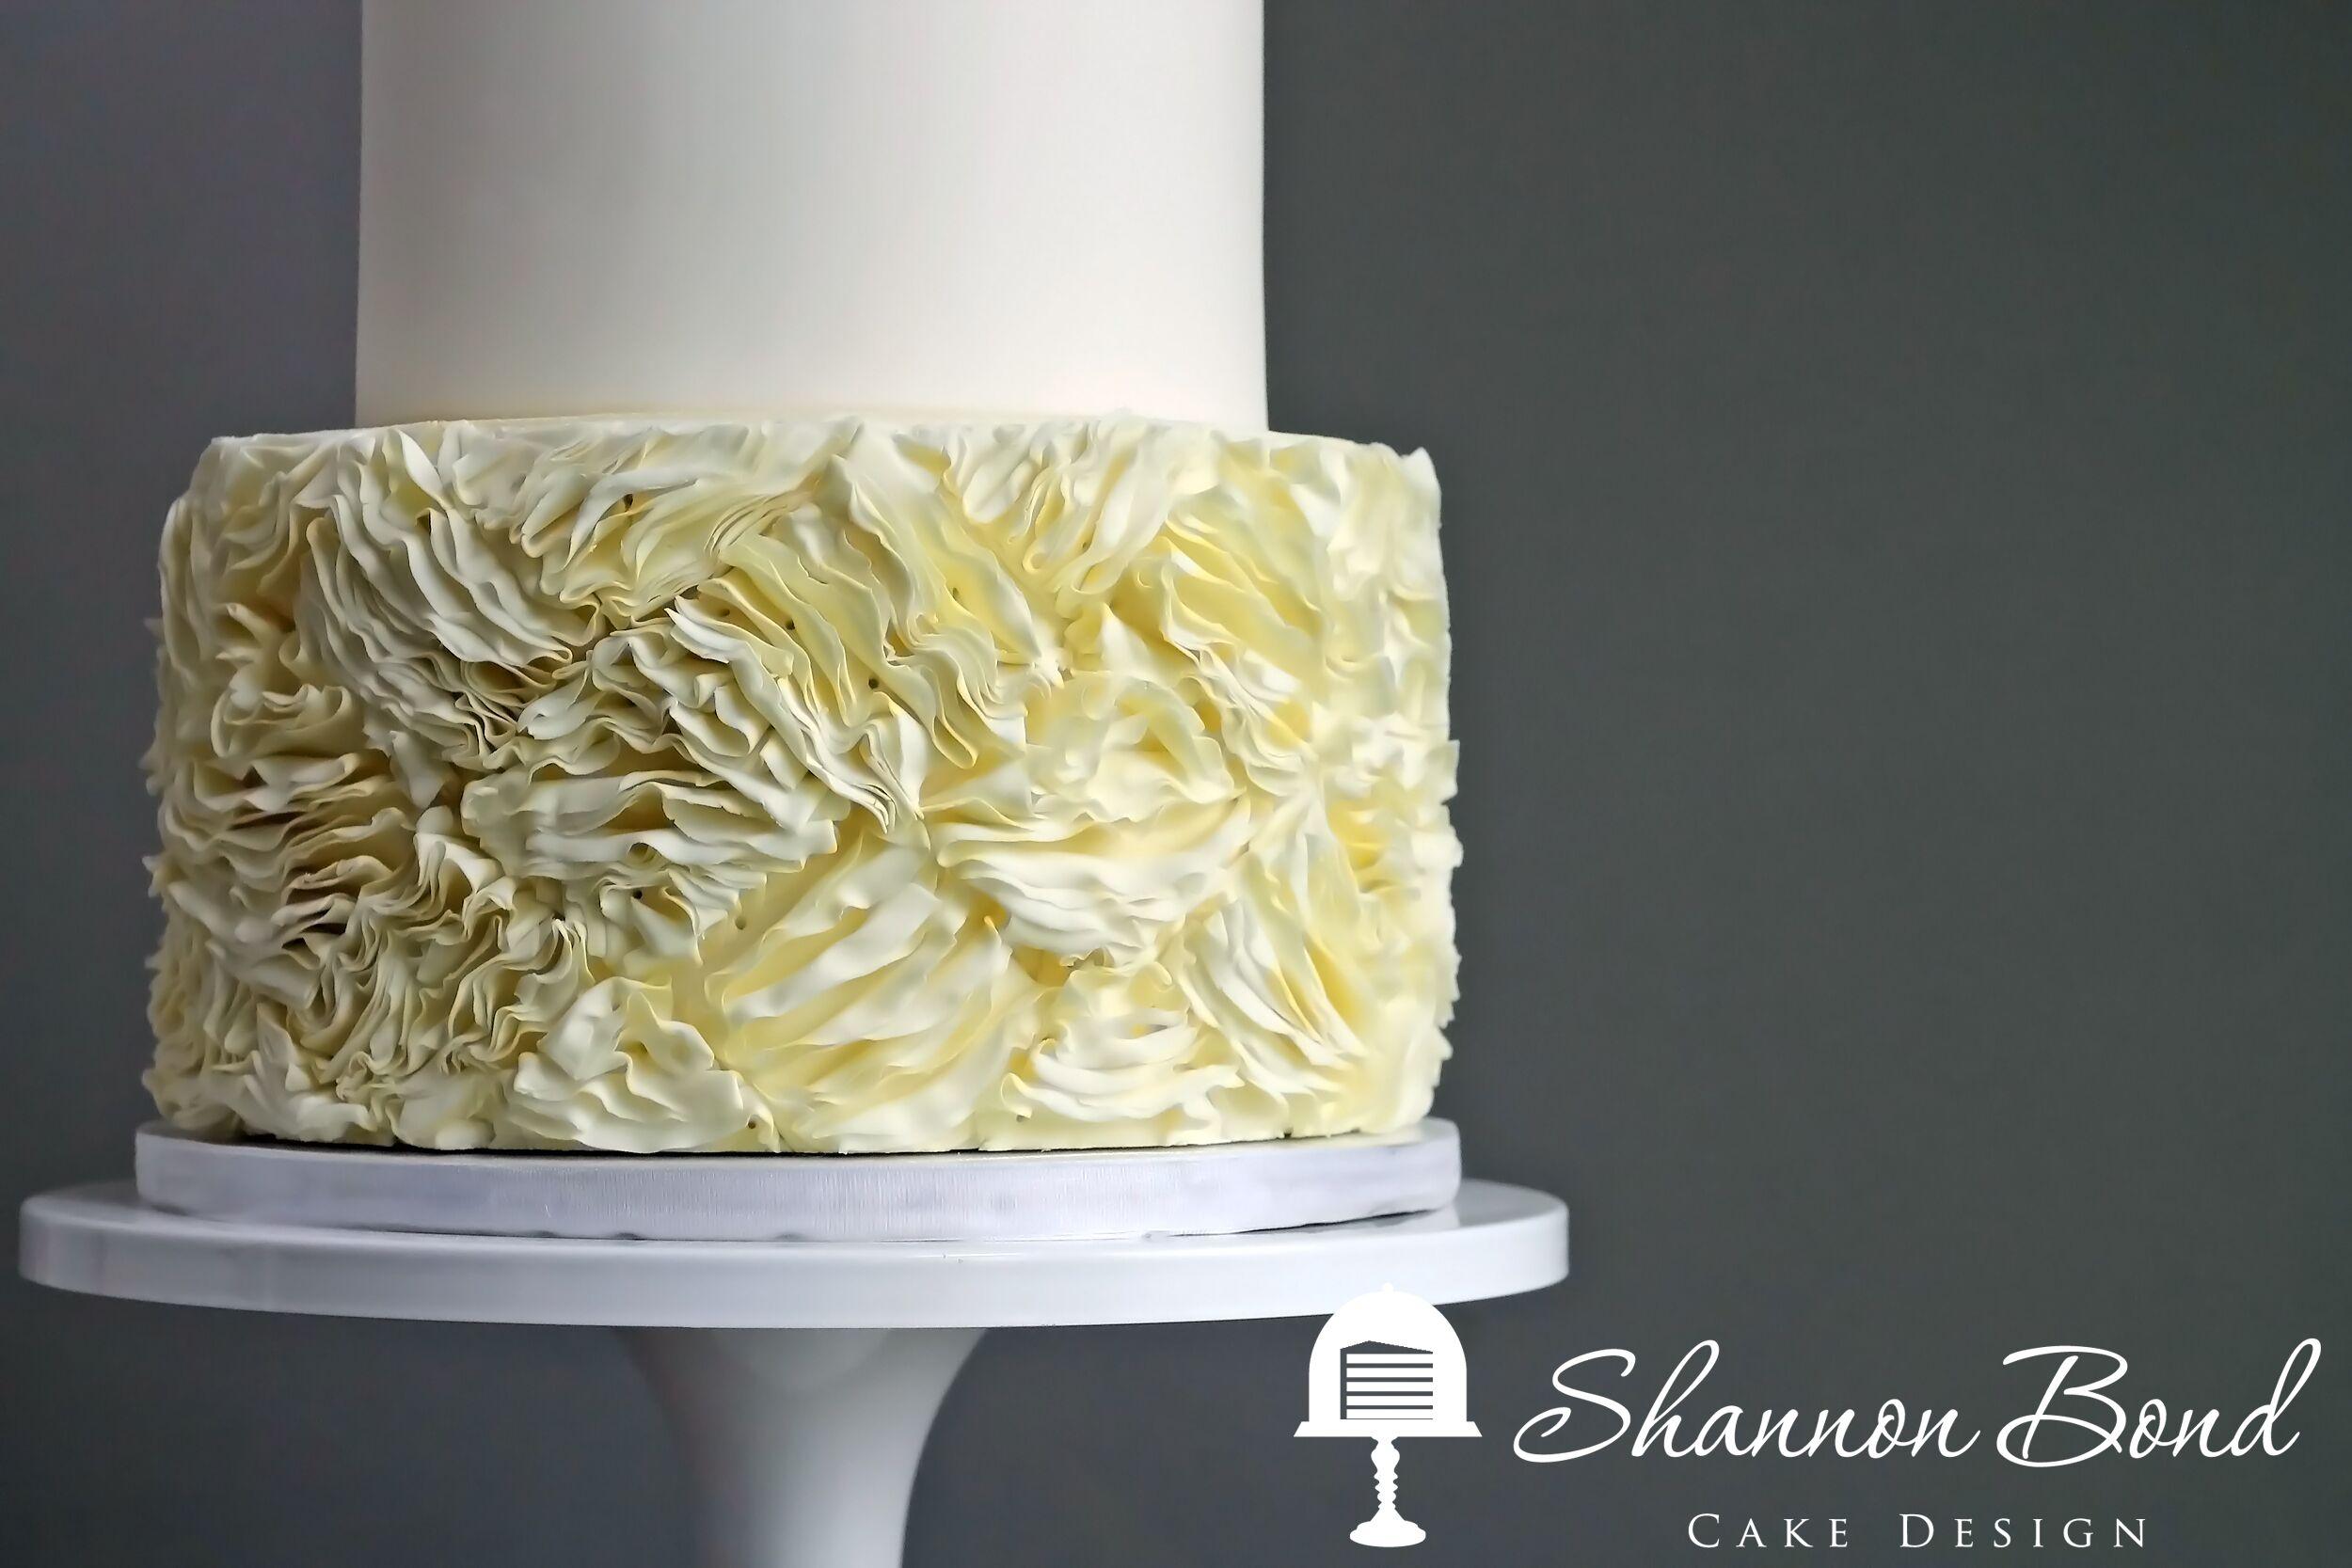 Wedding Cake Bakeries in Kansas City, MO - The Knot